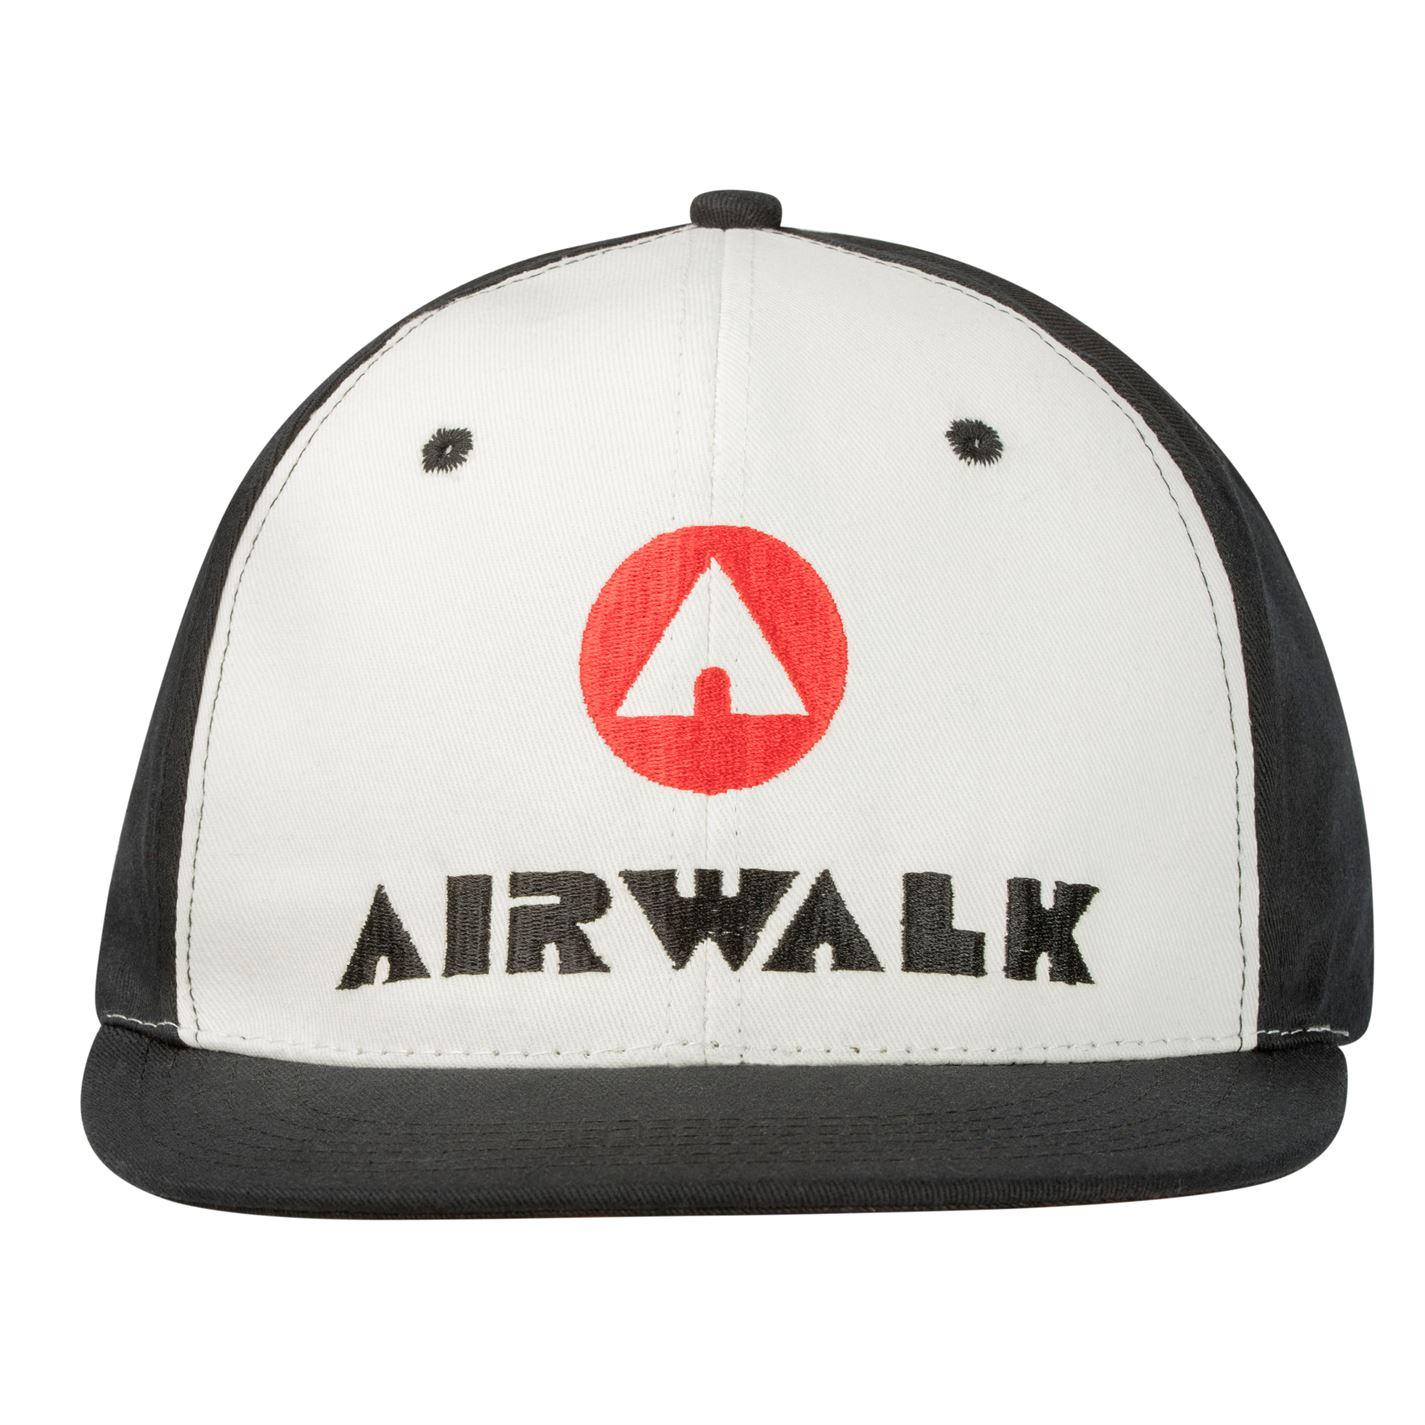 Airwalk Mens Flat Peak Cap